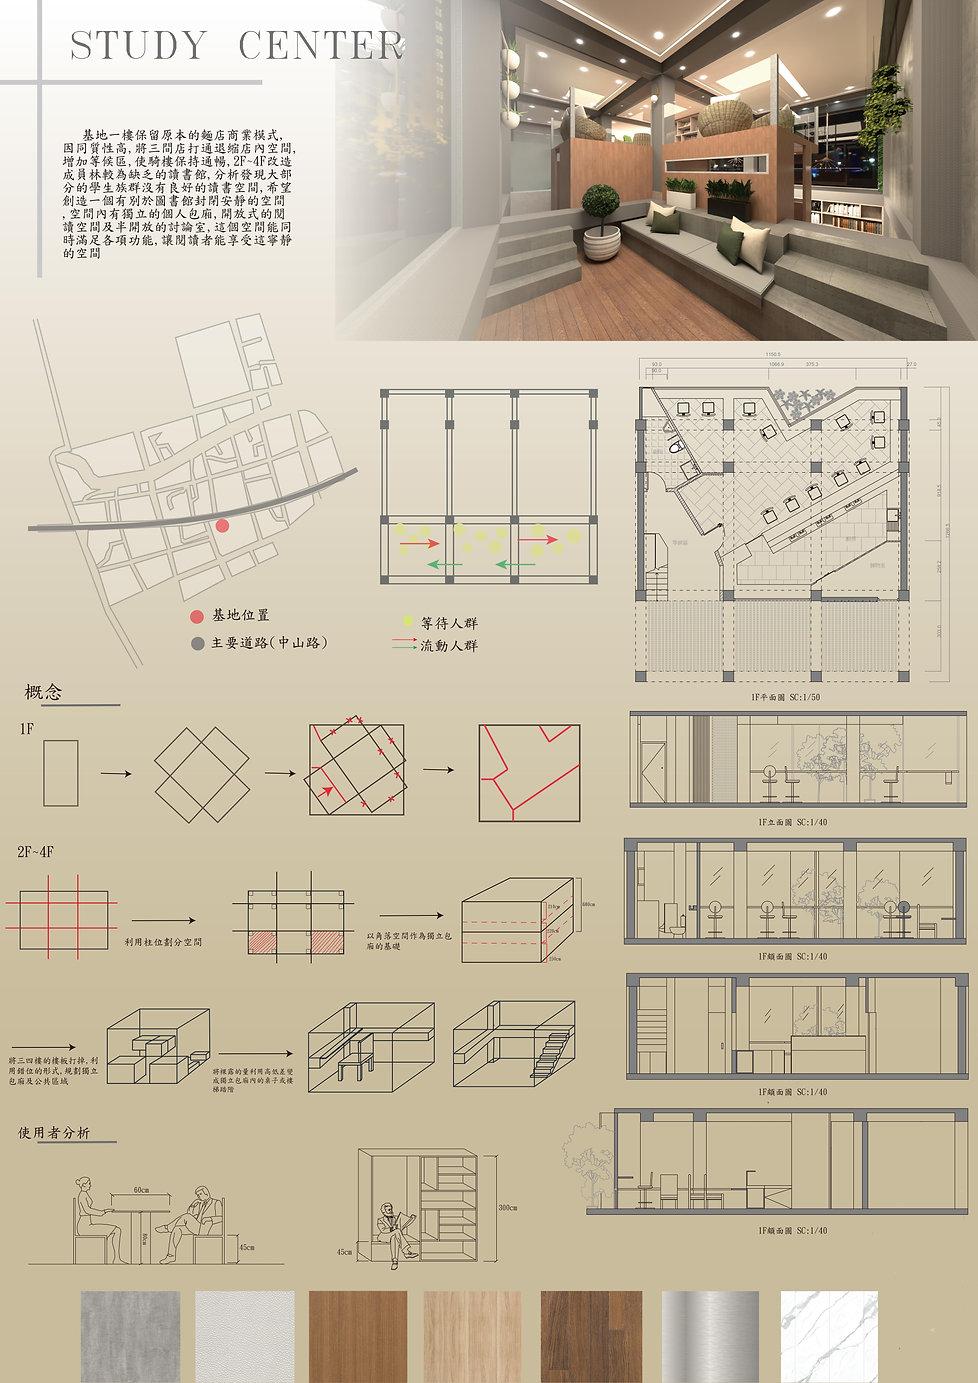 佳作_study center_1.jpg